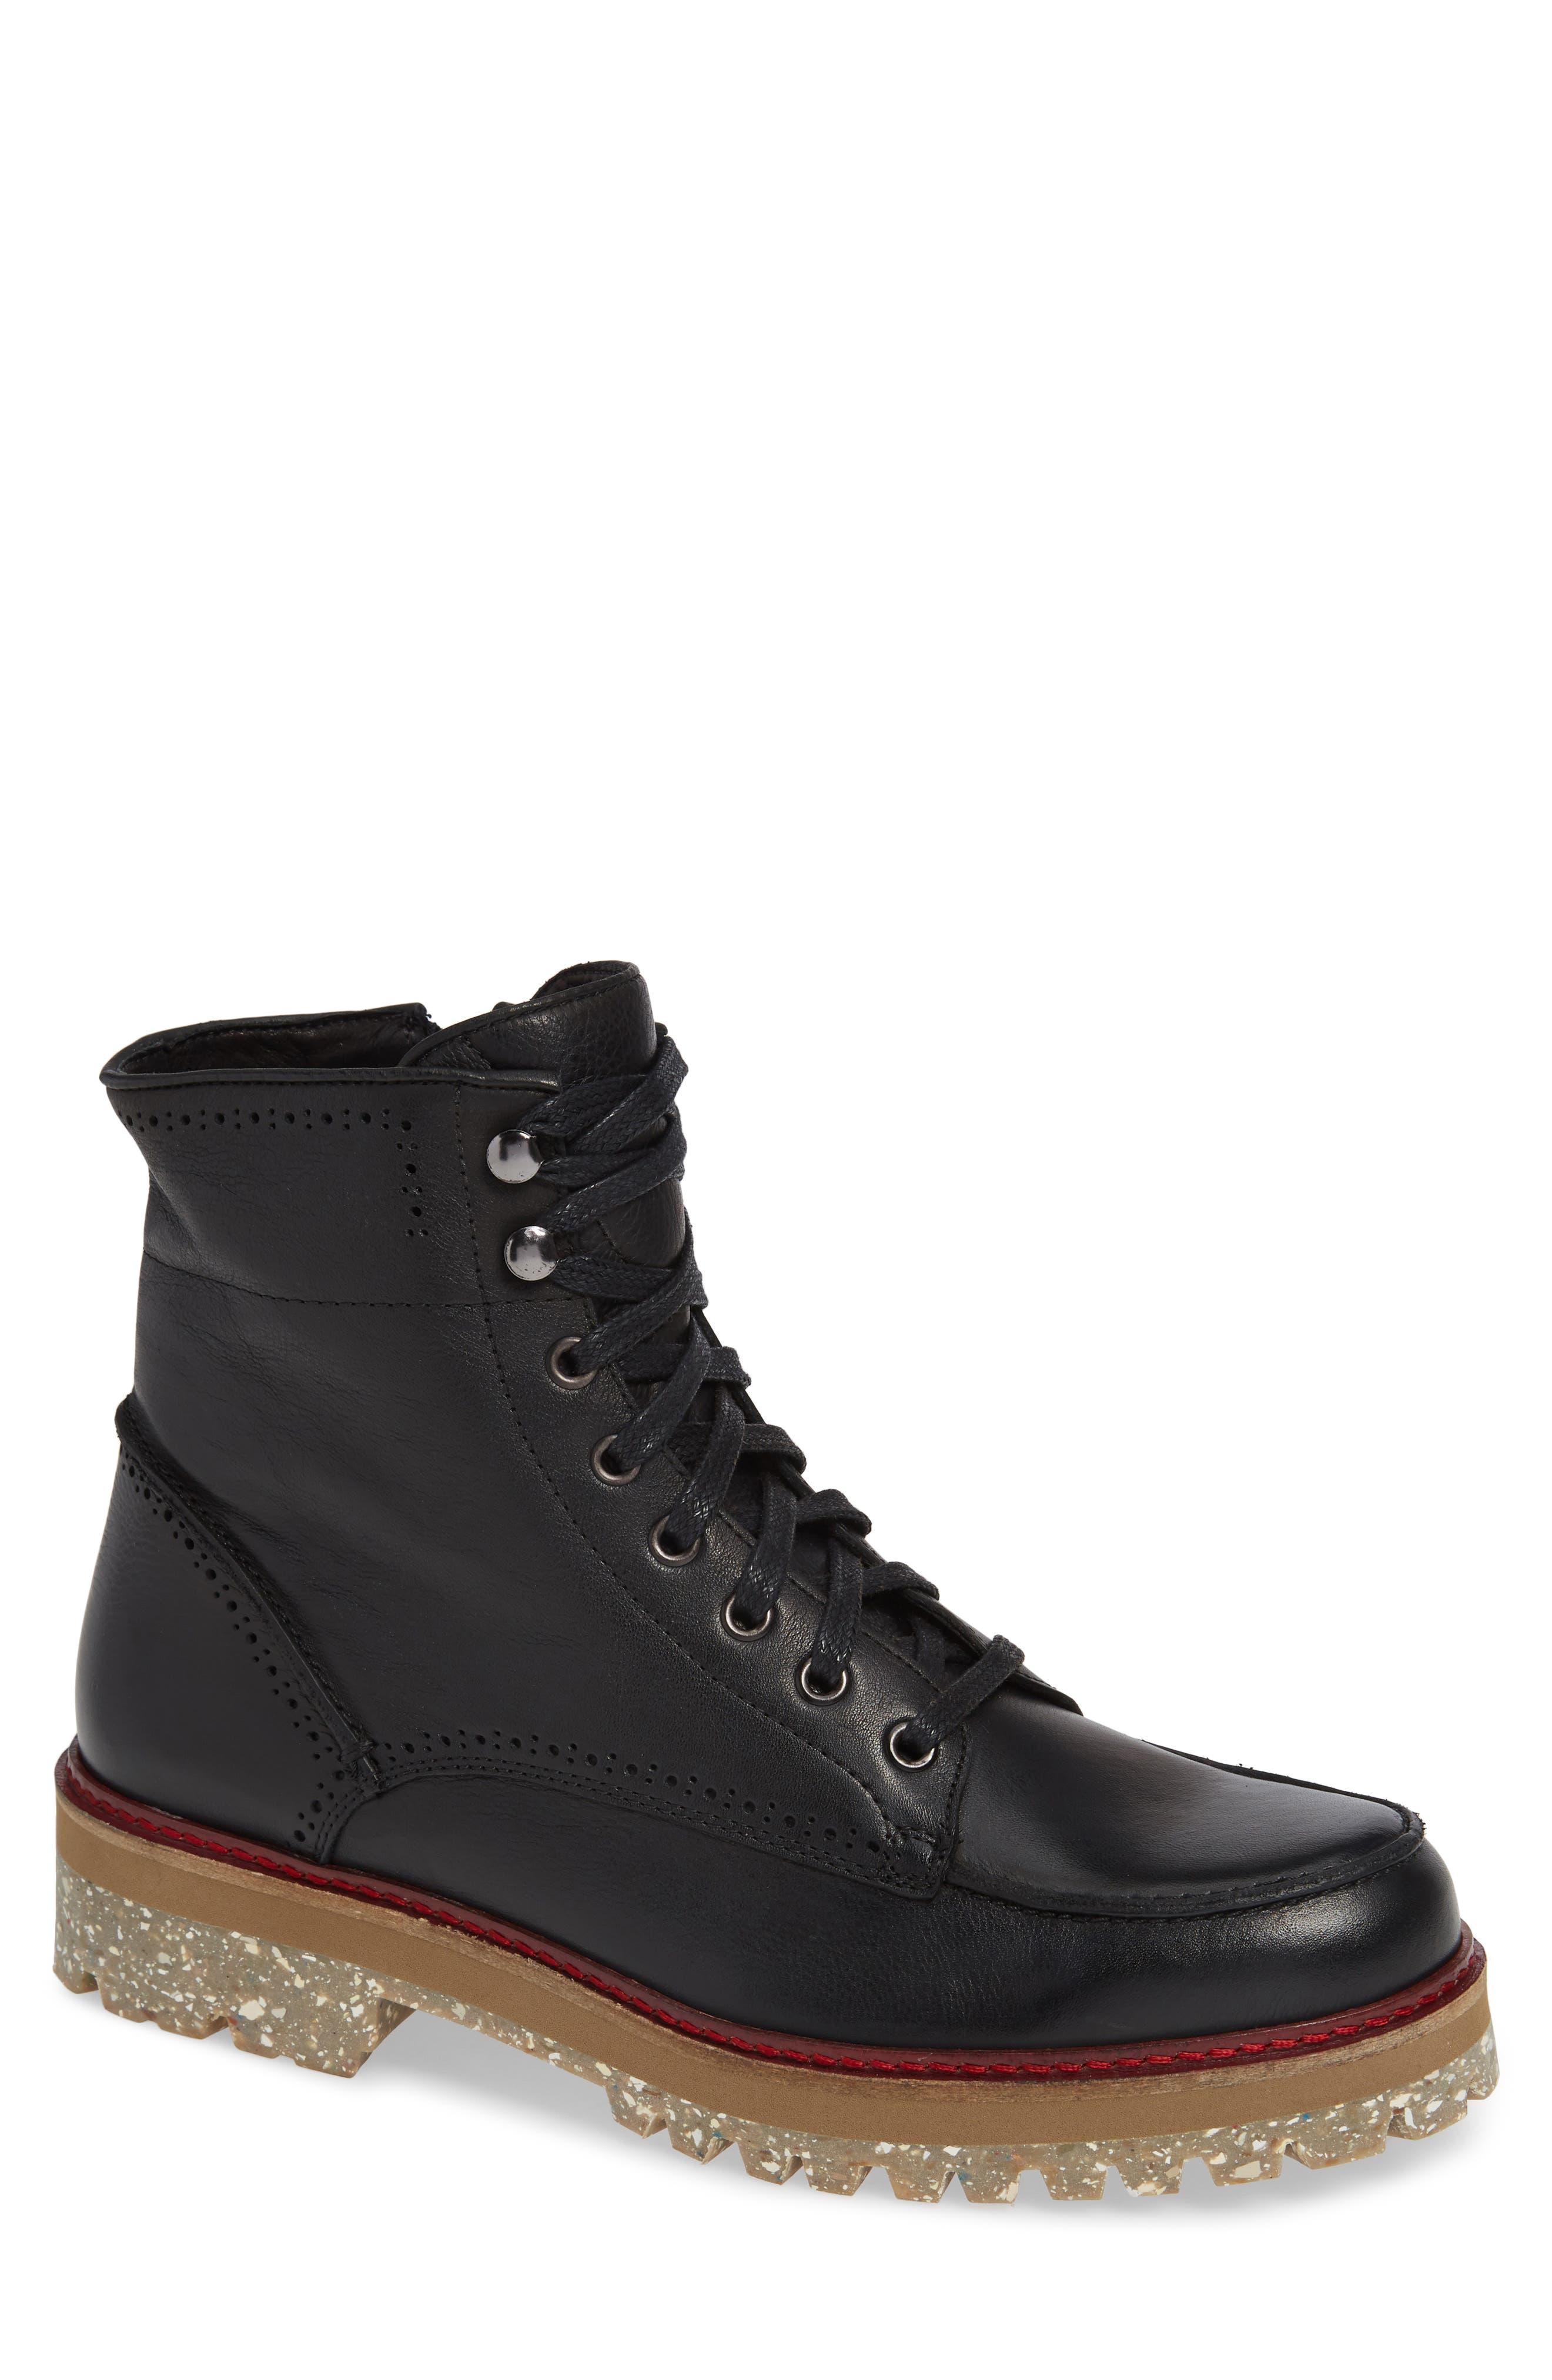 Larz Lugged Moc Toe Boot,                             Main thumbnail 1, color,                             BLACK